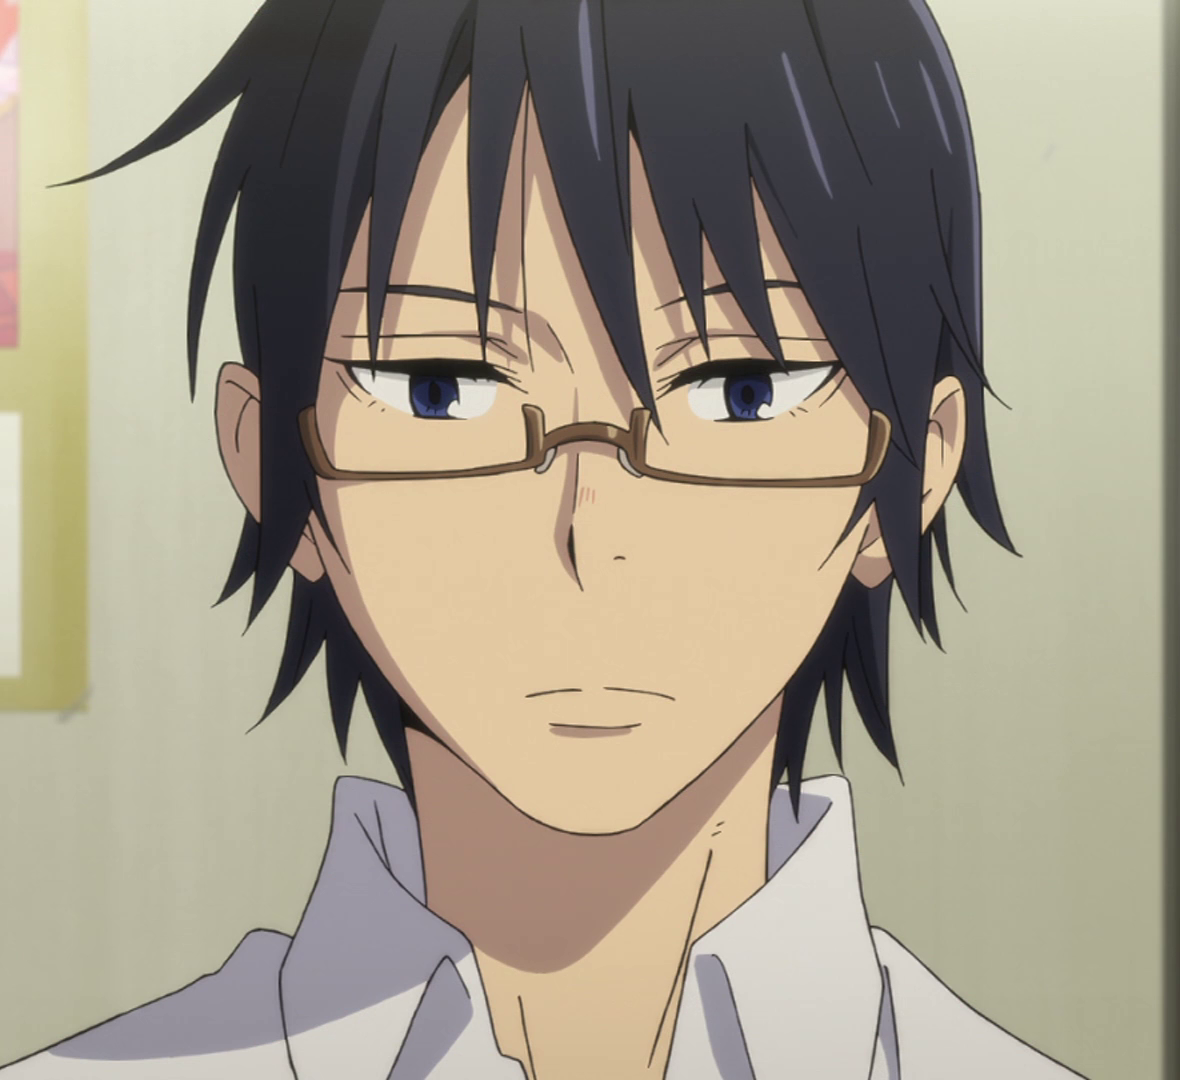 Gambar Male Anime Characters 4 oleh Eli Esh Inai, Manga